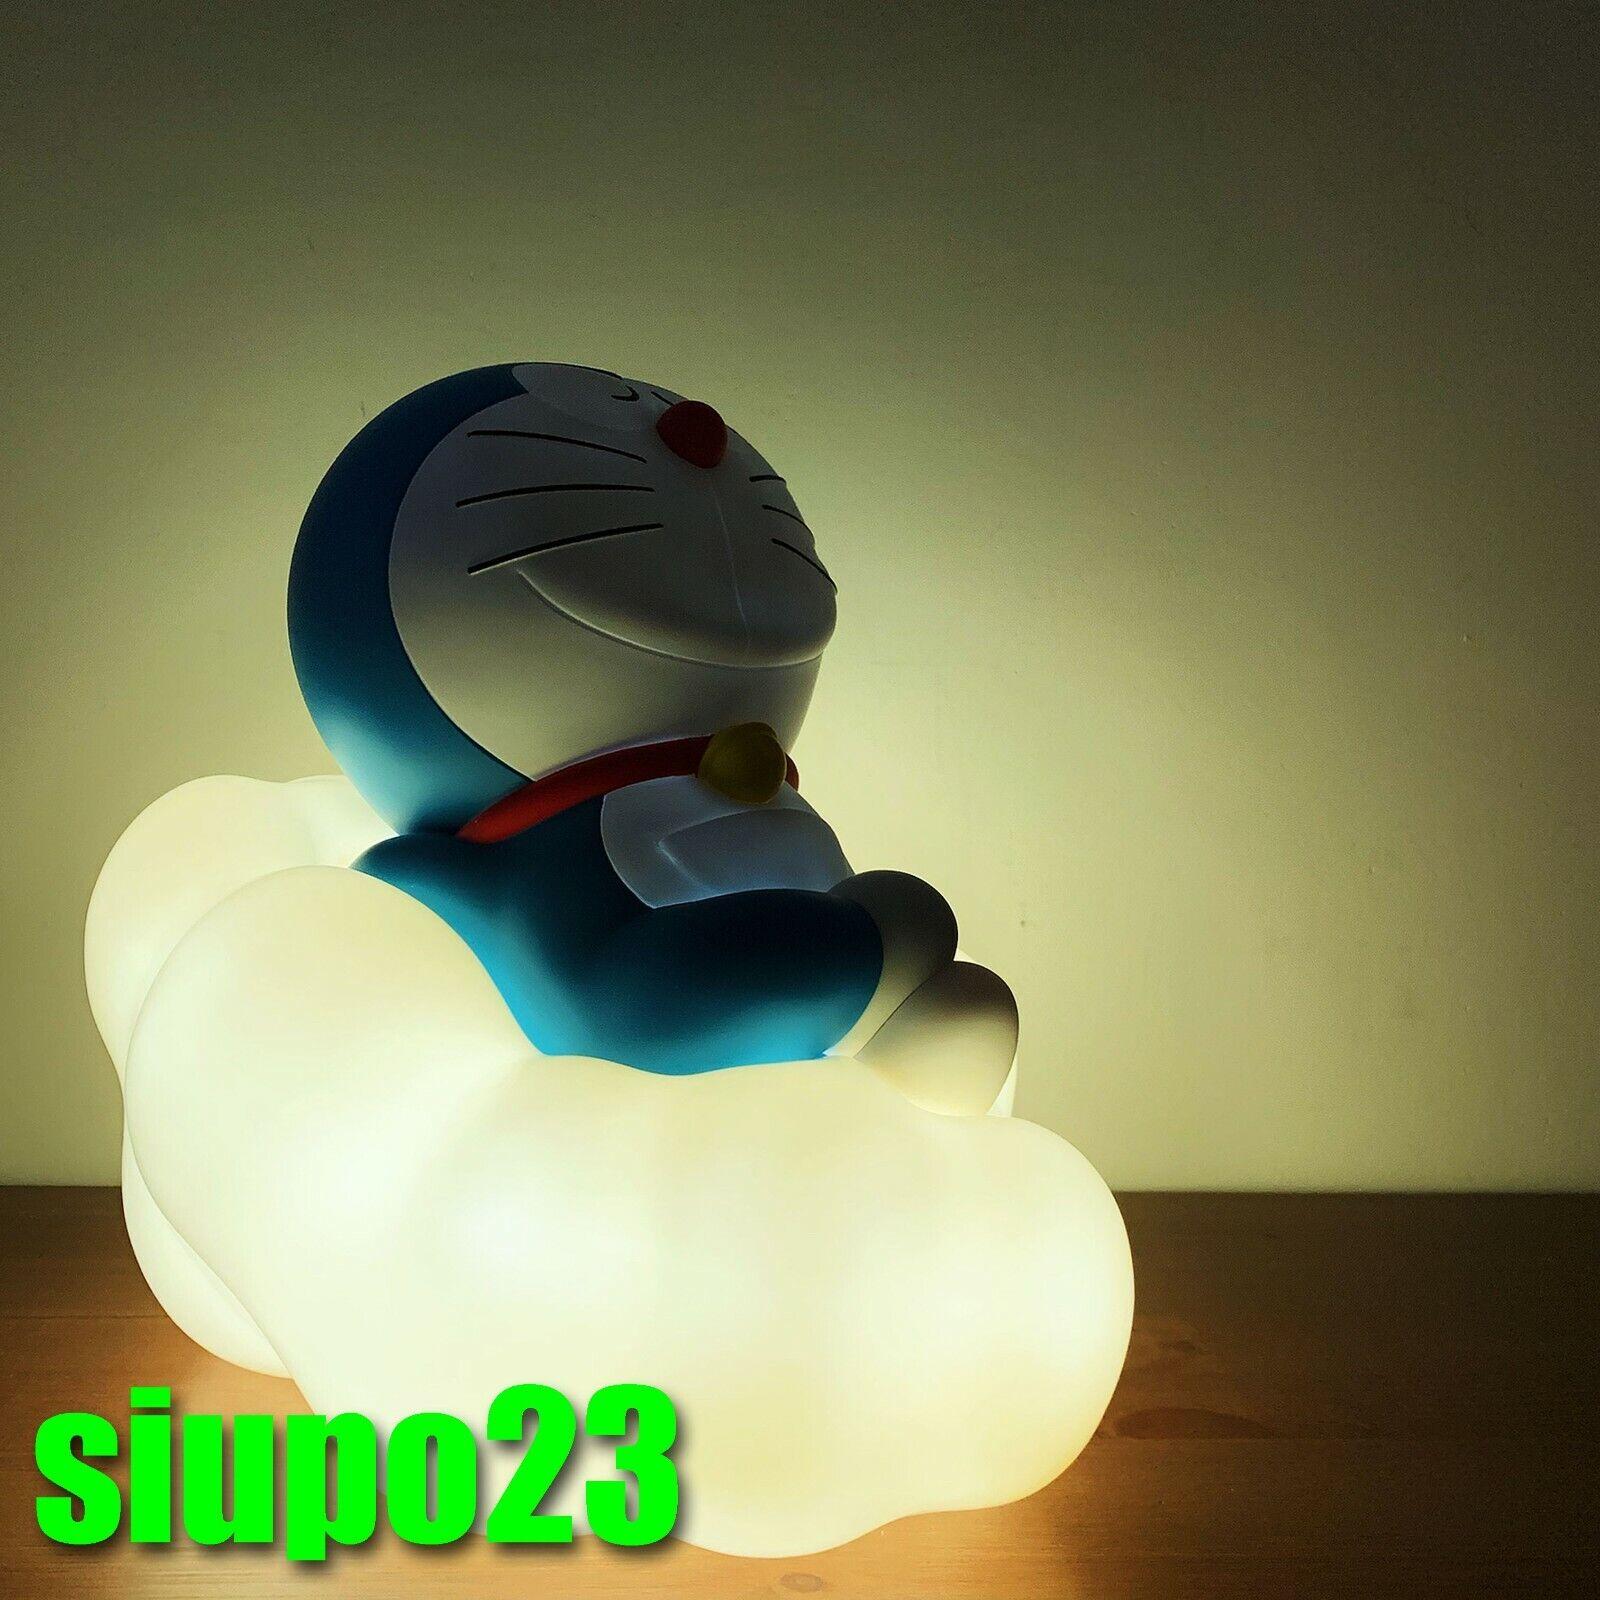 Macott  Station  Doraemon USB Lighting Cloud  buona qualità